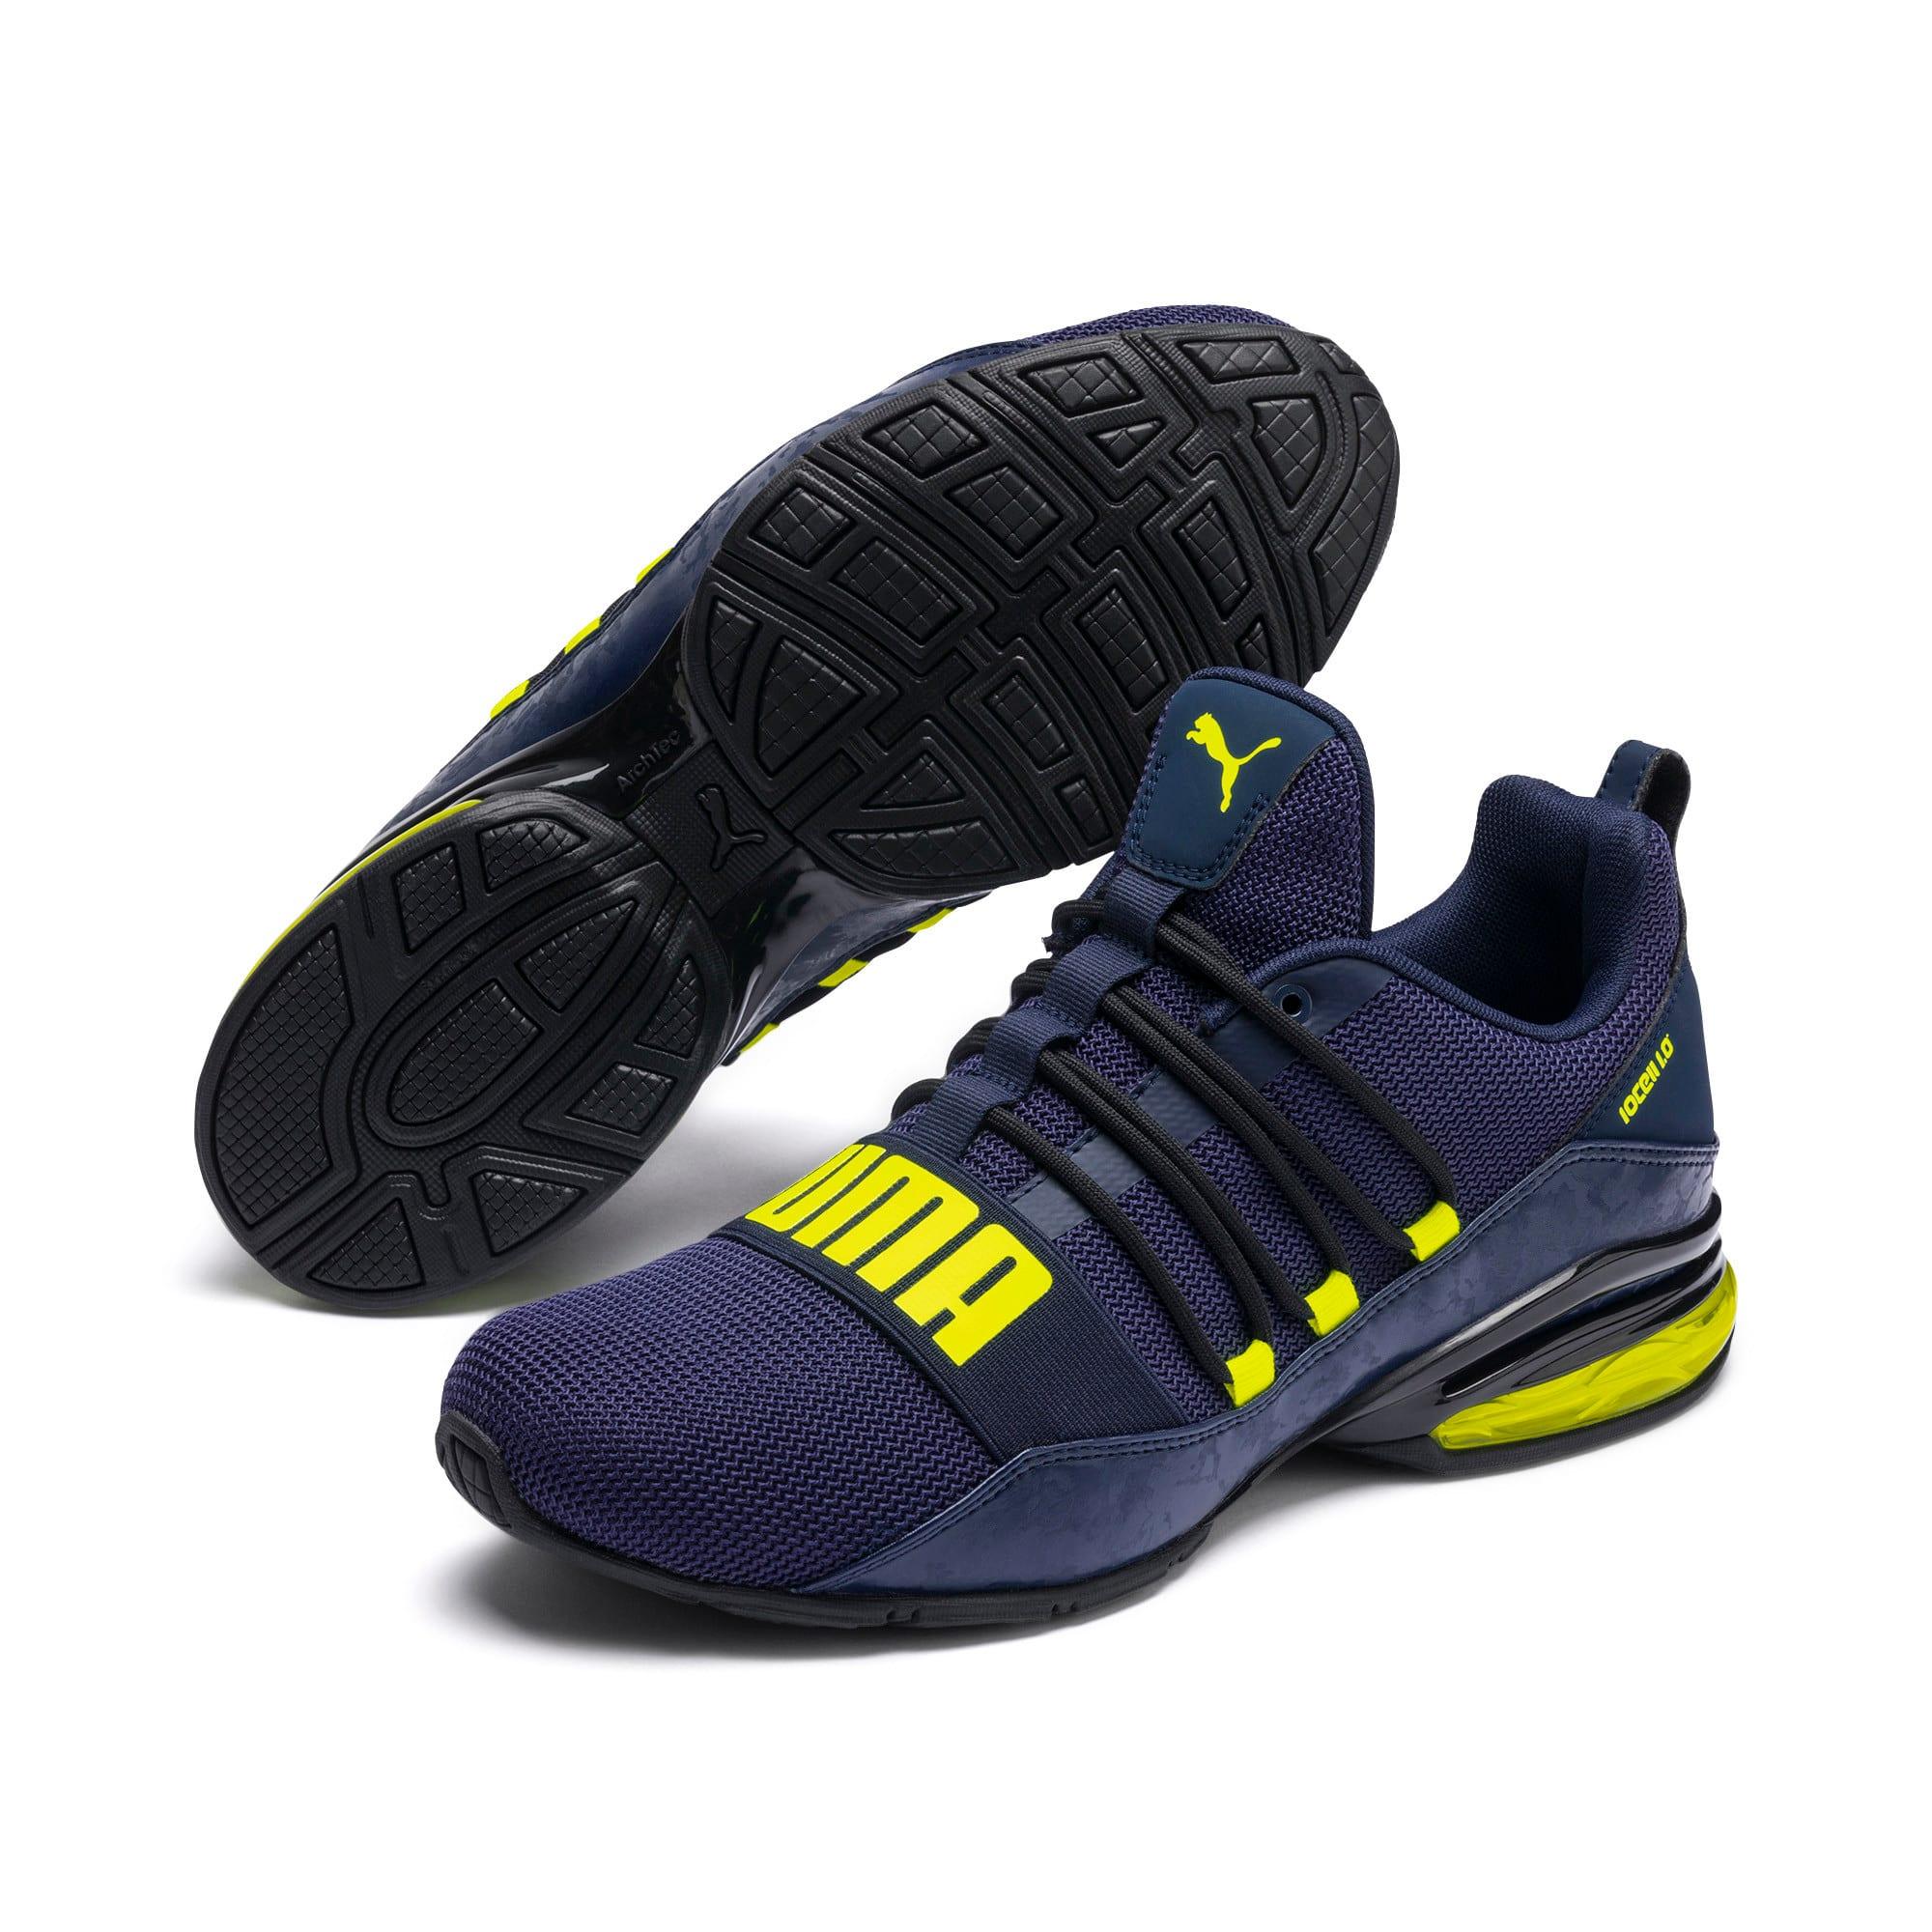 Thumbnail 3 of CELL Regulate Camo Men's Training Shoes, Peacoat-Yellow Alert, medium